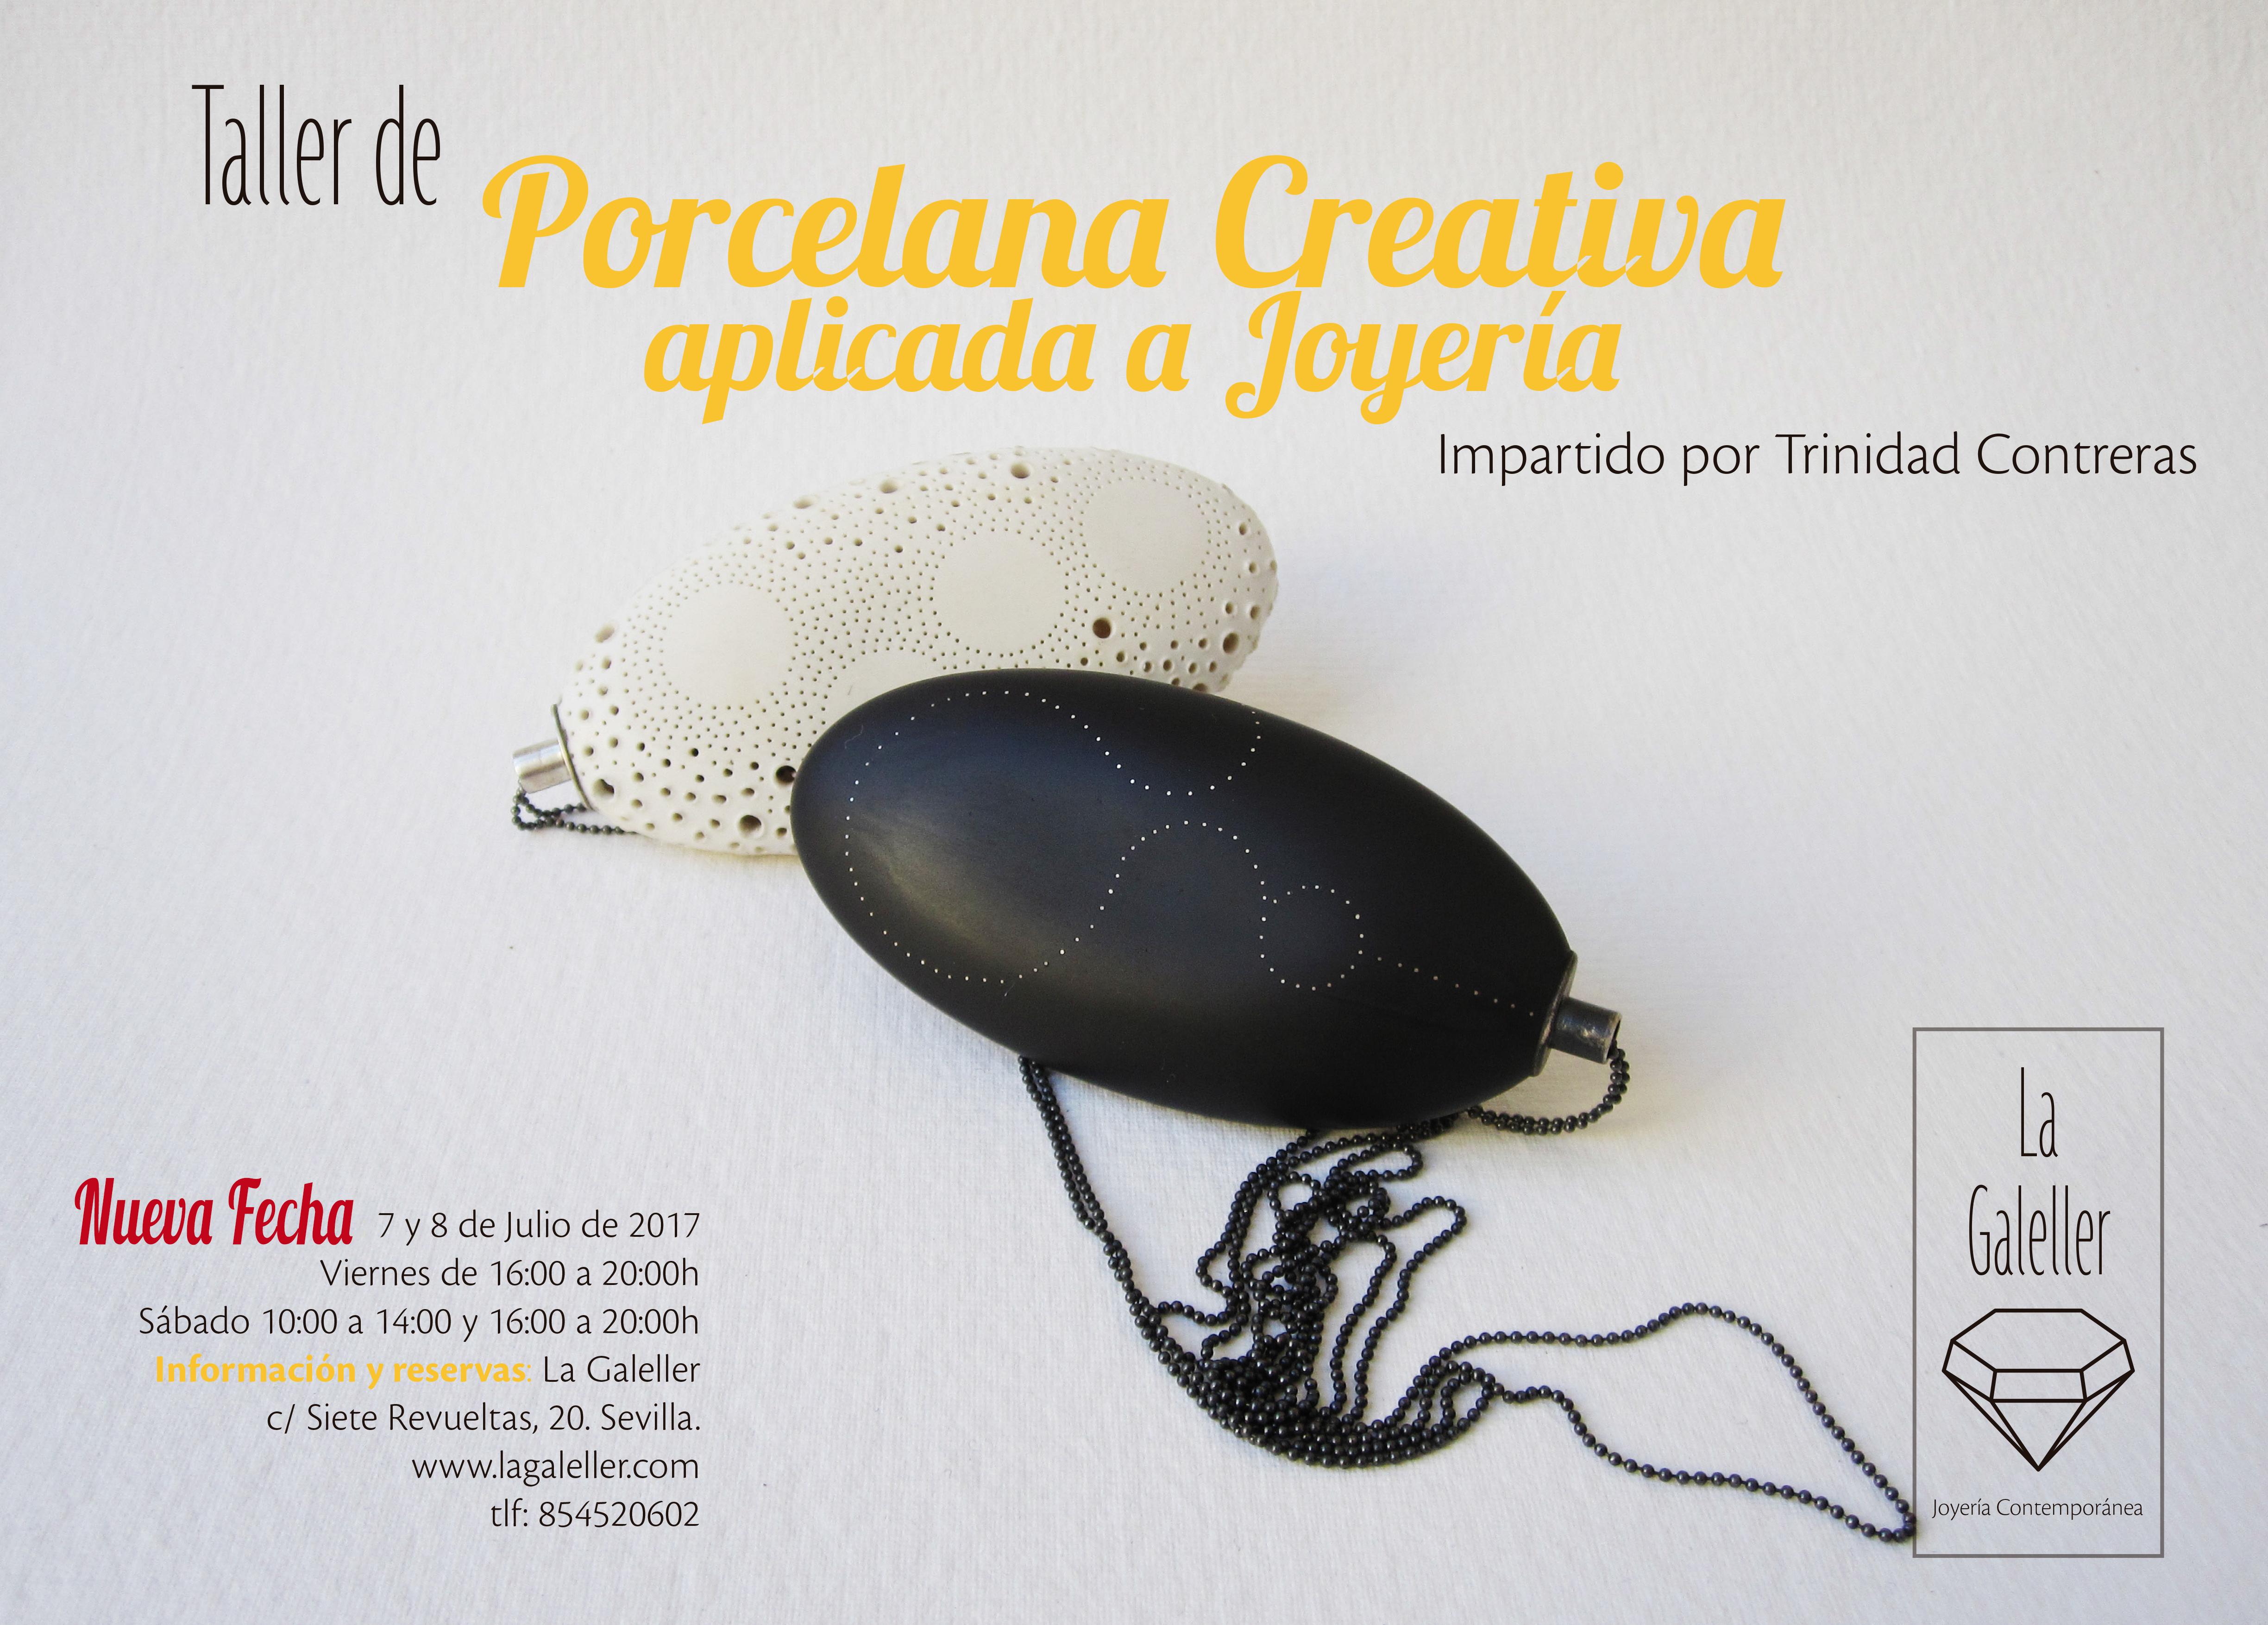 Porcelana Creativa en Joyería